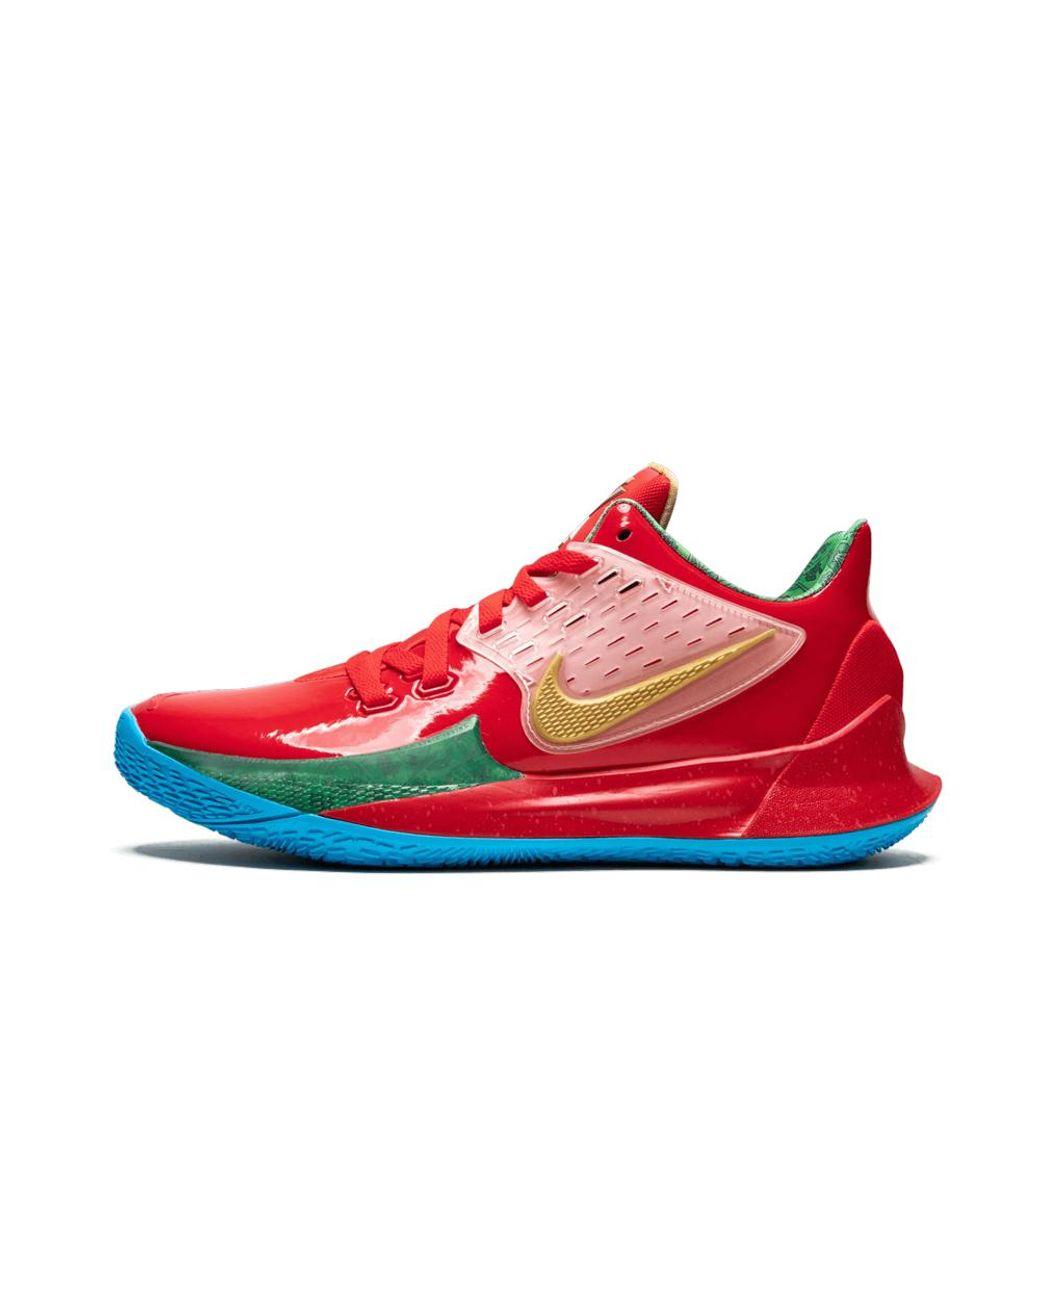 Nike Kyrie Low 2 'mr. Krabs' Shoes